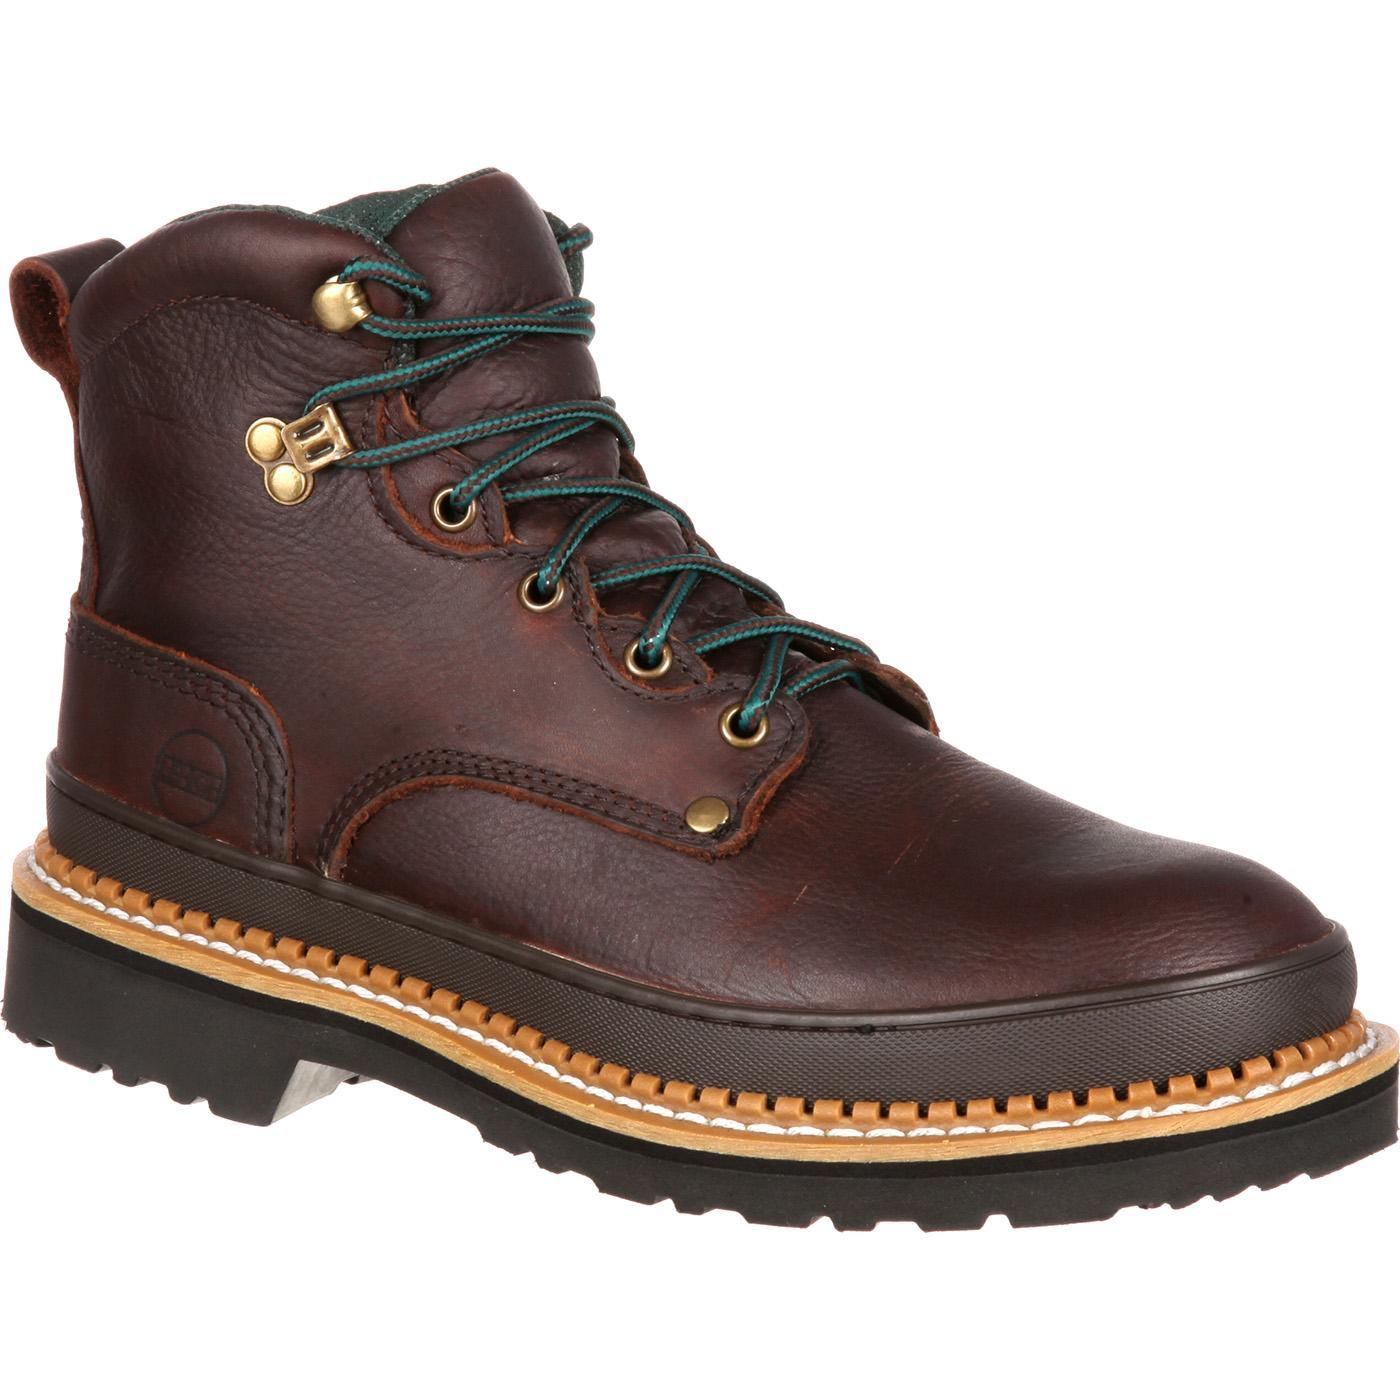 fad3dbd8aa46 Lehigh Safety Shoes Steel Toe Work BootLehigh Safety Shoes Steel Toe Work  Boot